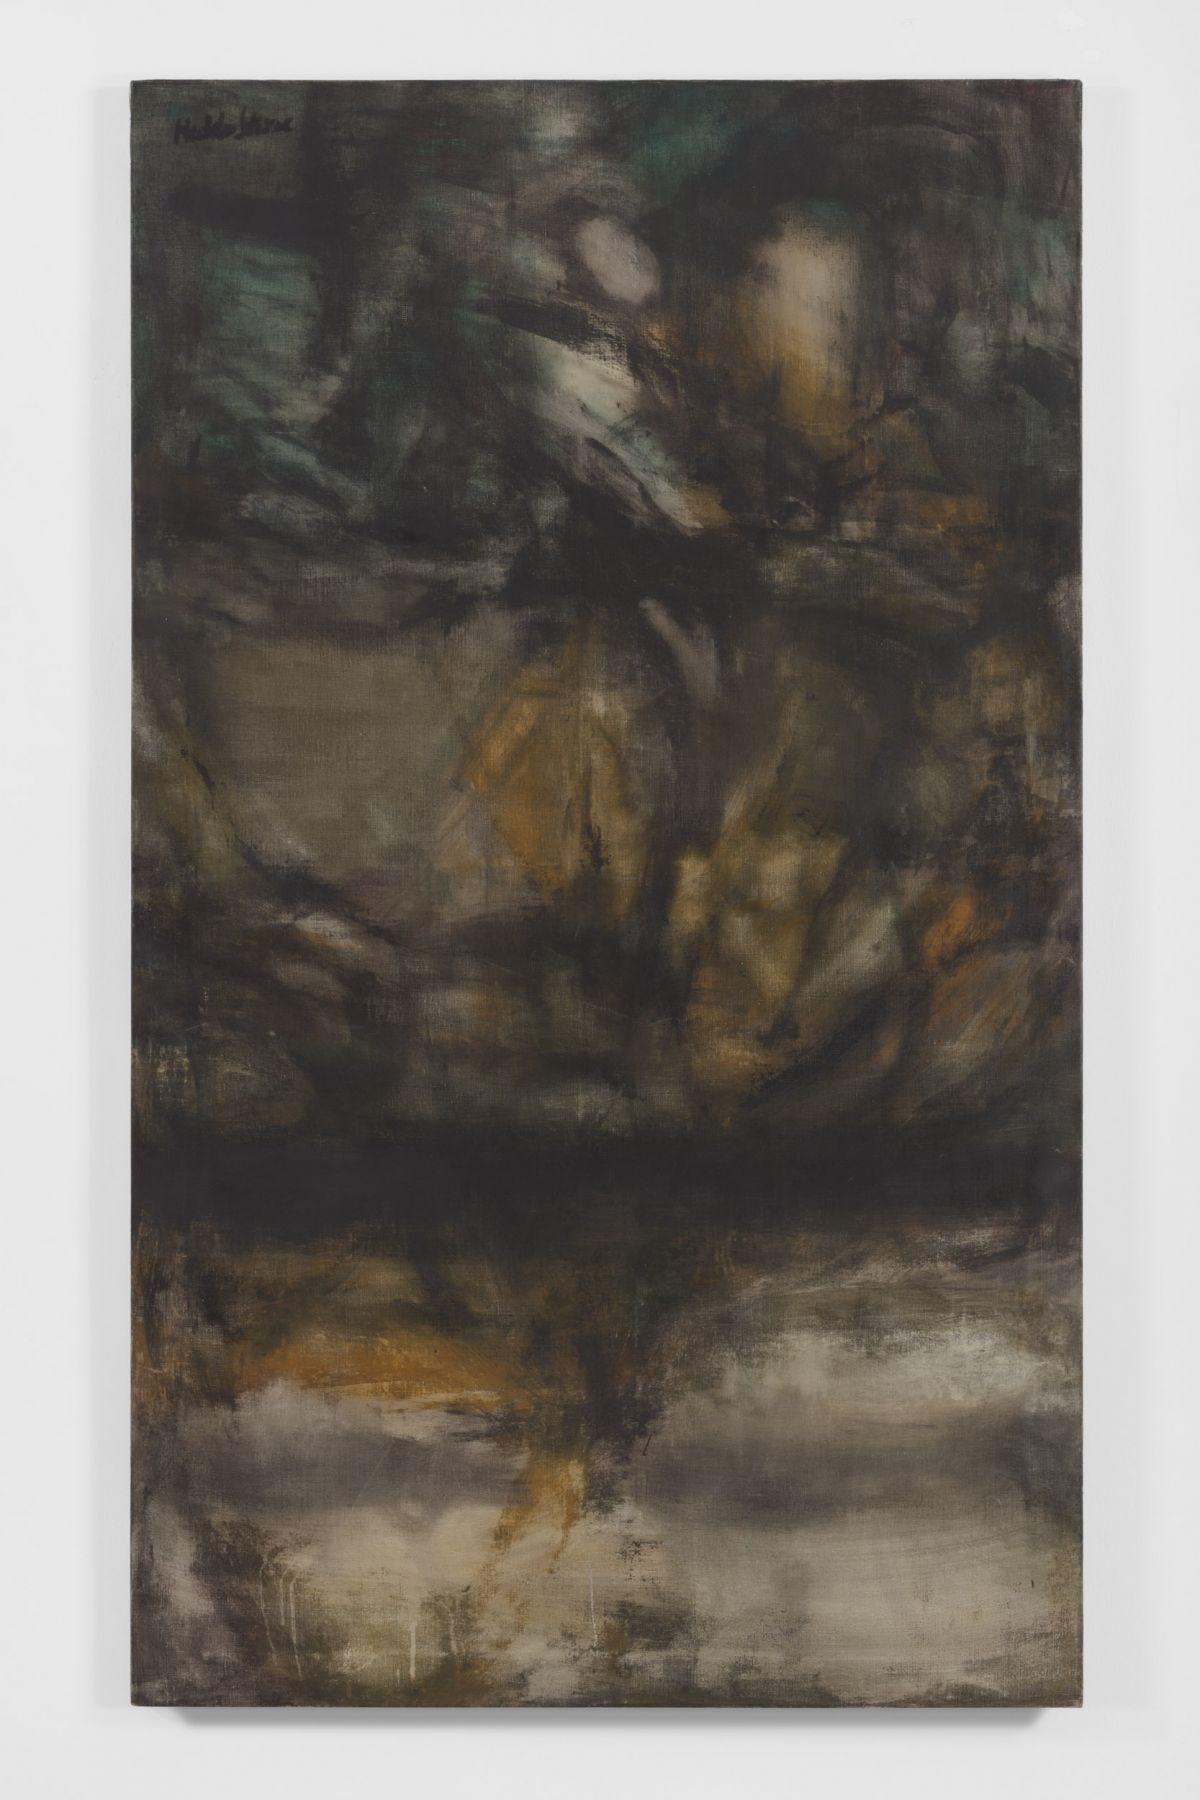 #1-1959,1959 Oil on canvas